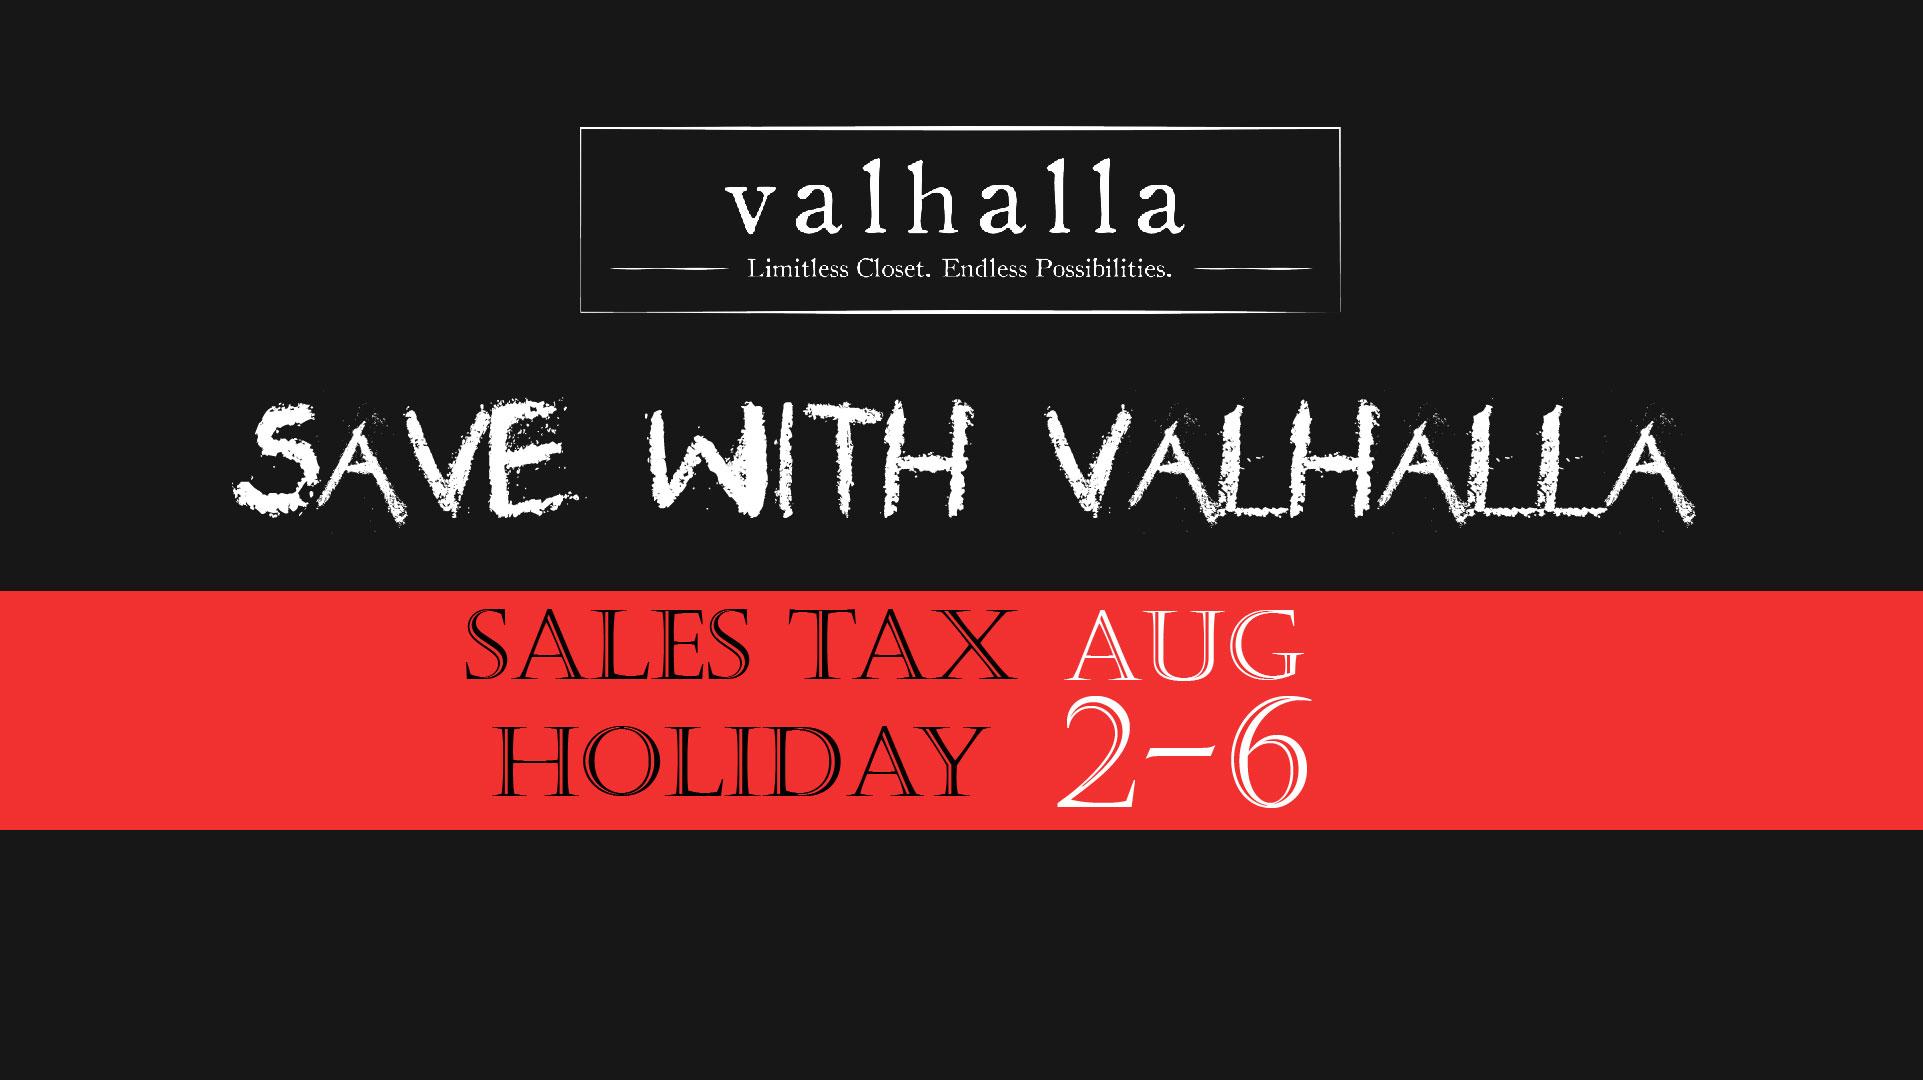 Valhalla tax free week